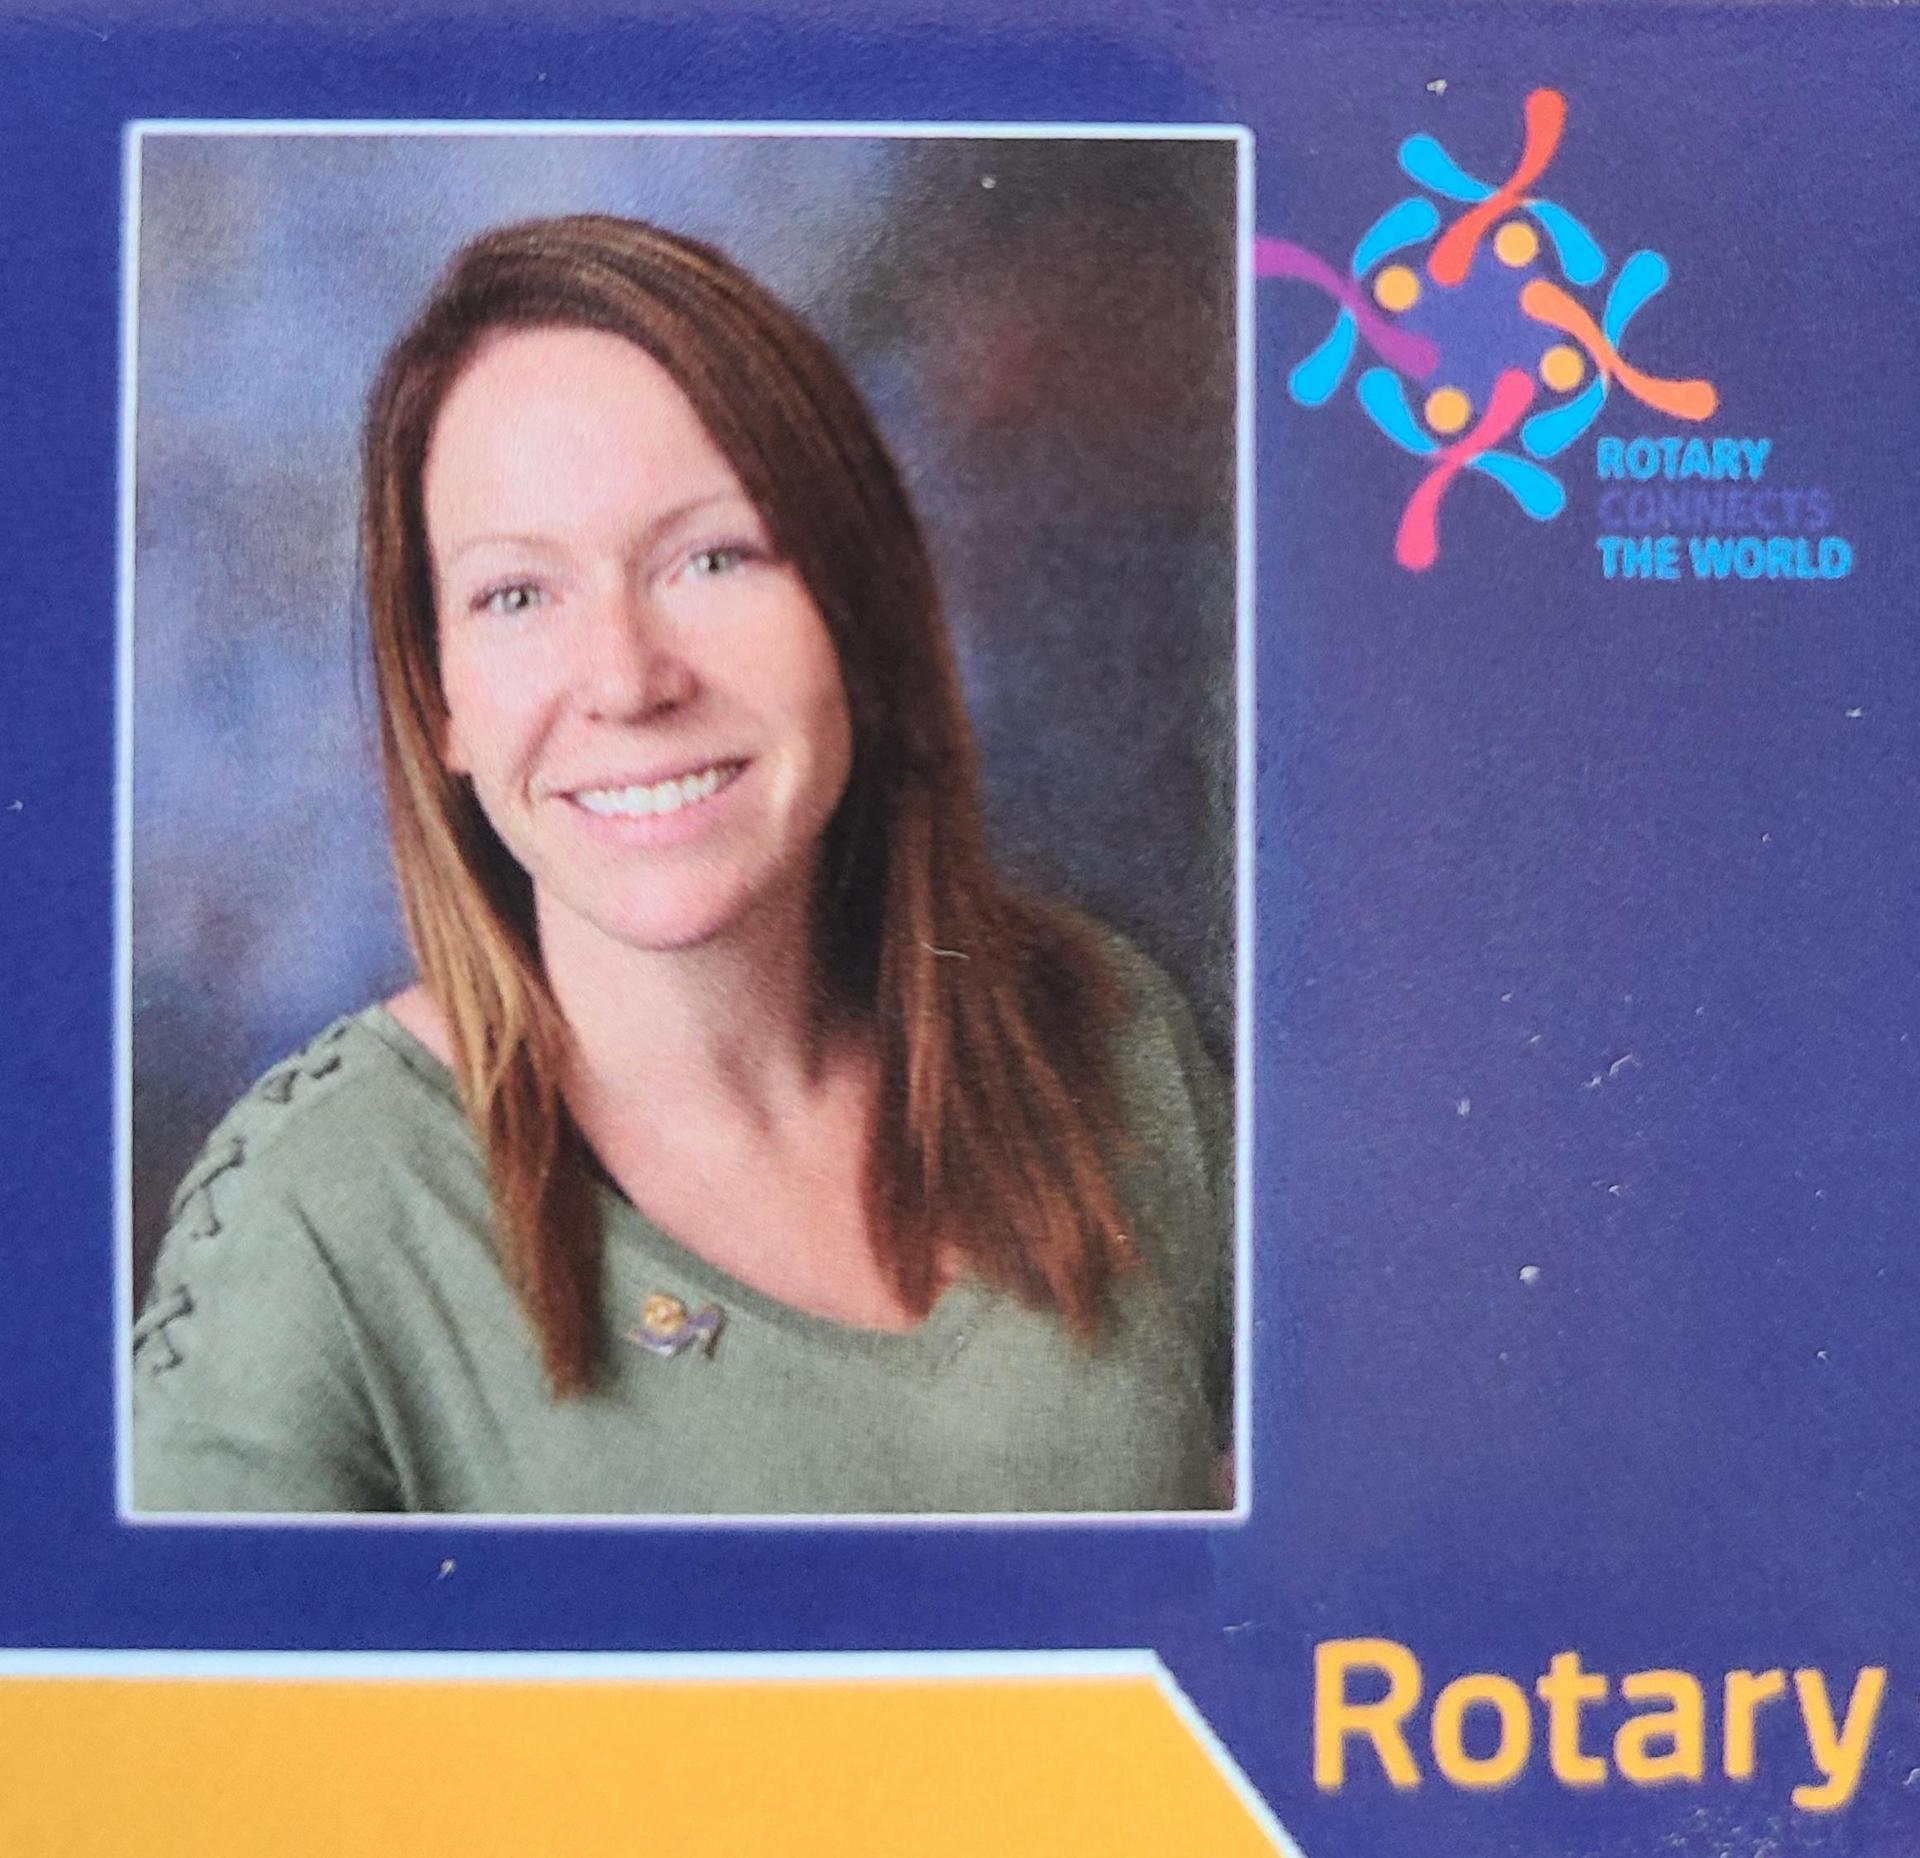 Mrs. Brittany Driesler